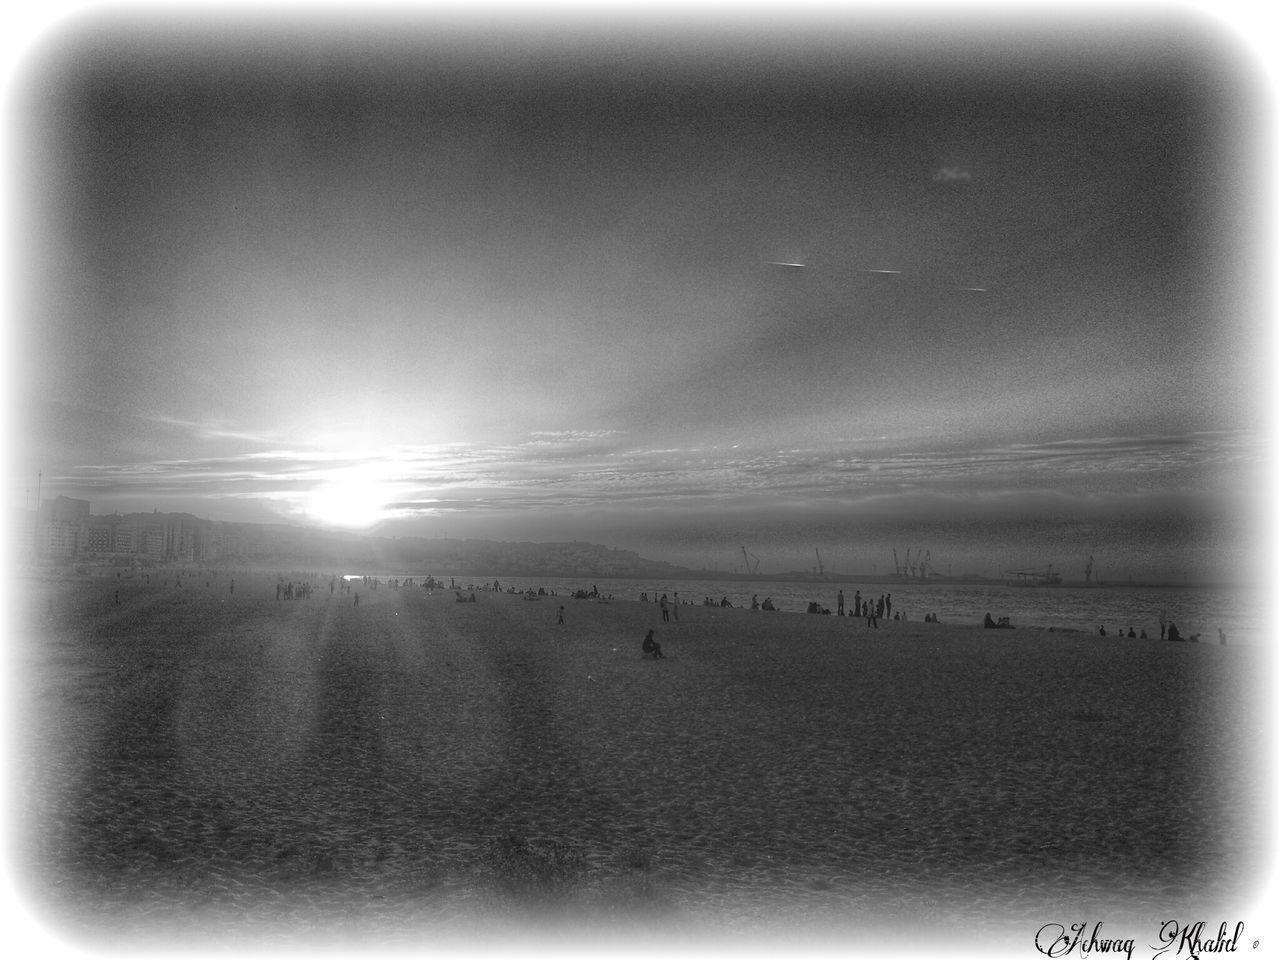 Sunset in Blackandwhite over Tangier! Monochrome